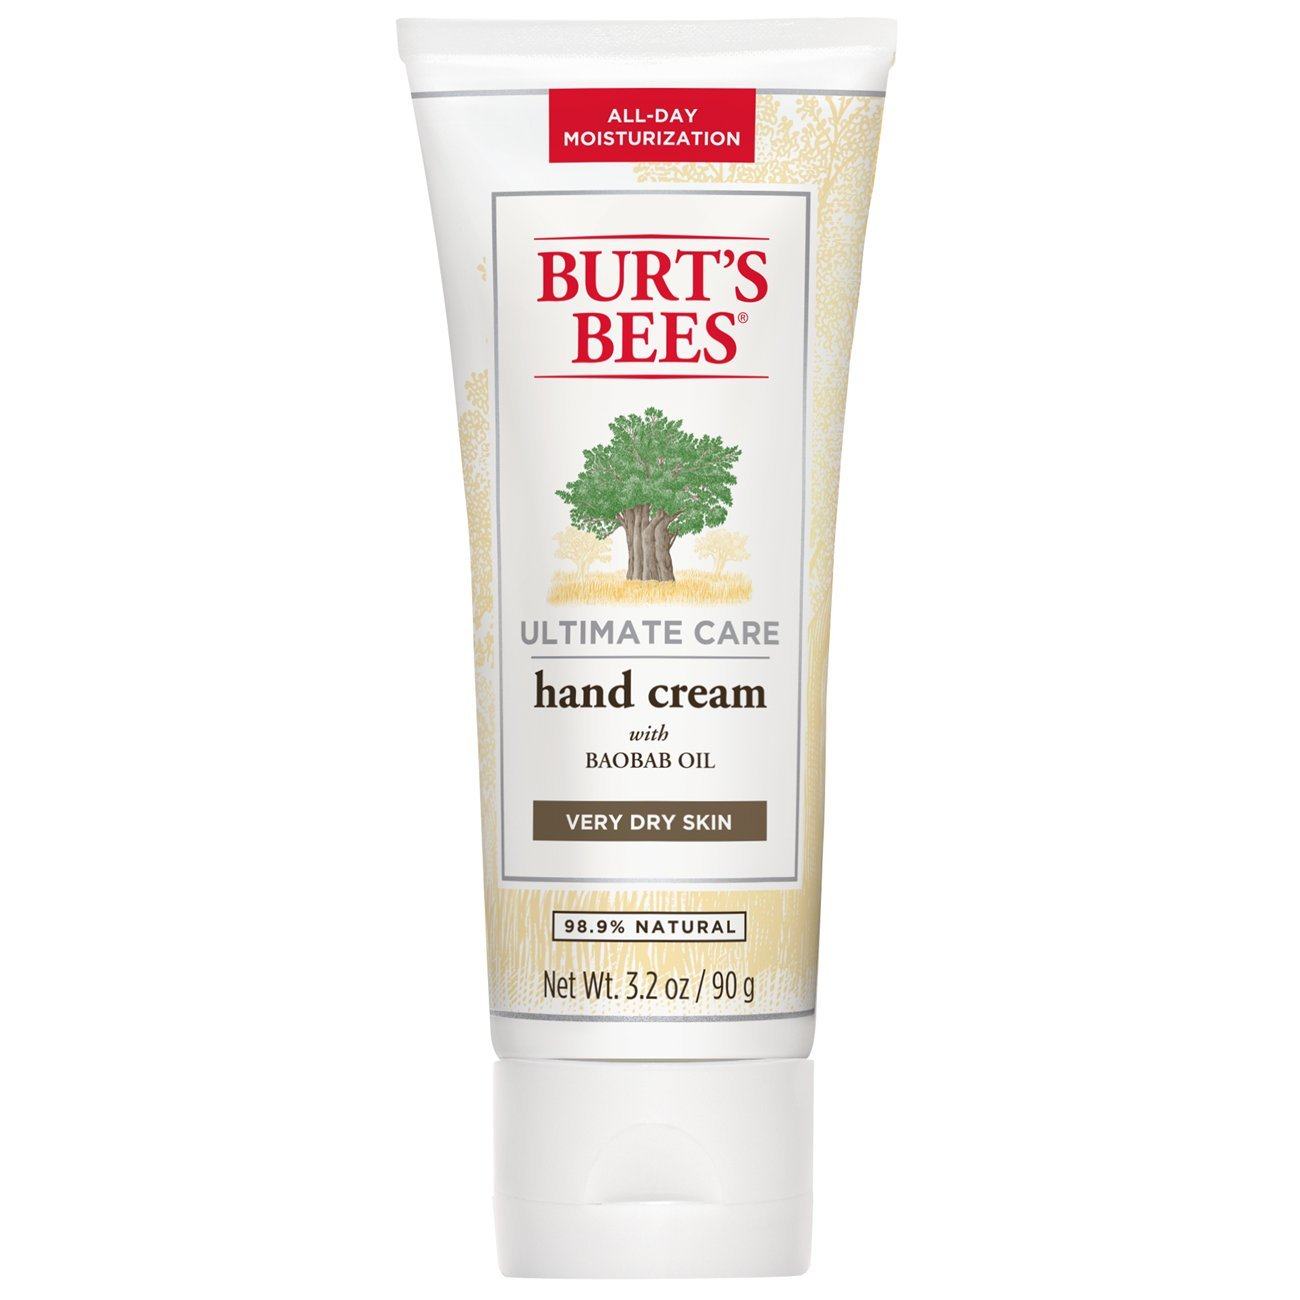 Burt's Bees Ultimate Care Hand Cream - 3.2 Ounce Tube Burt' s Bees Inc. 9285001290